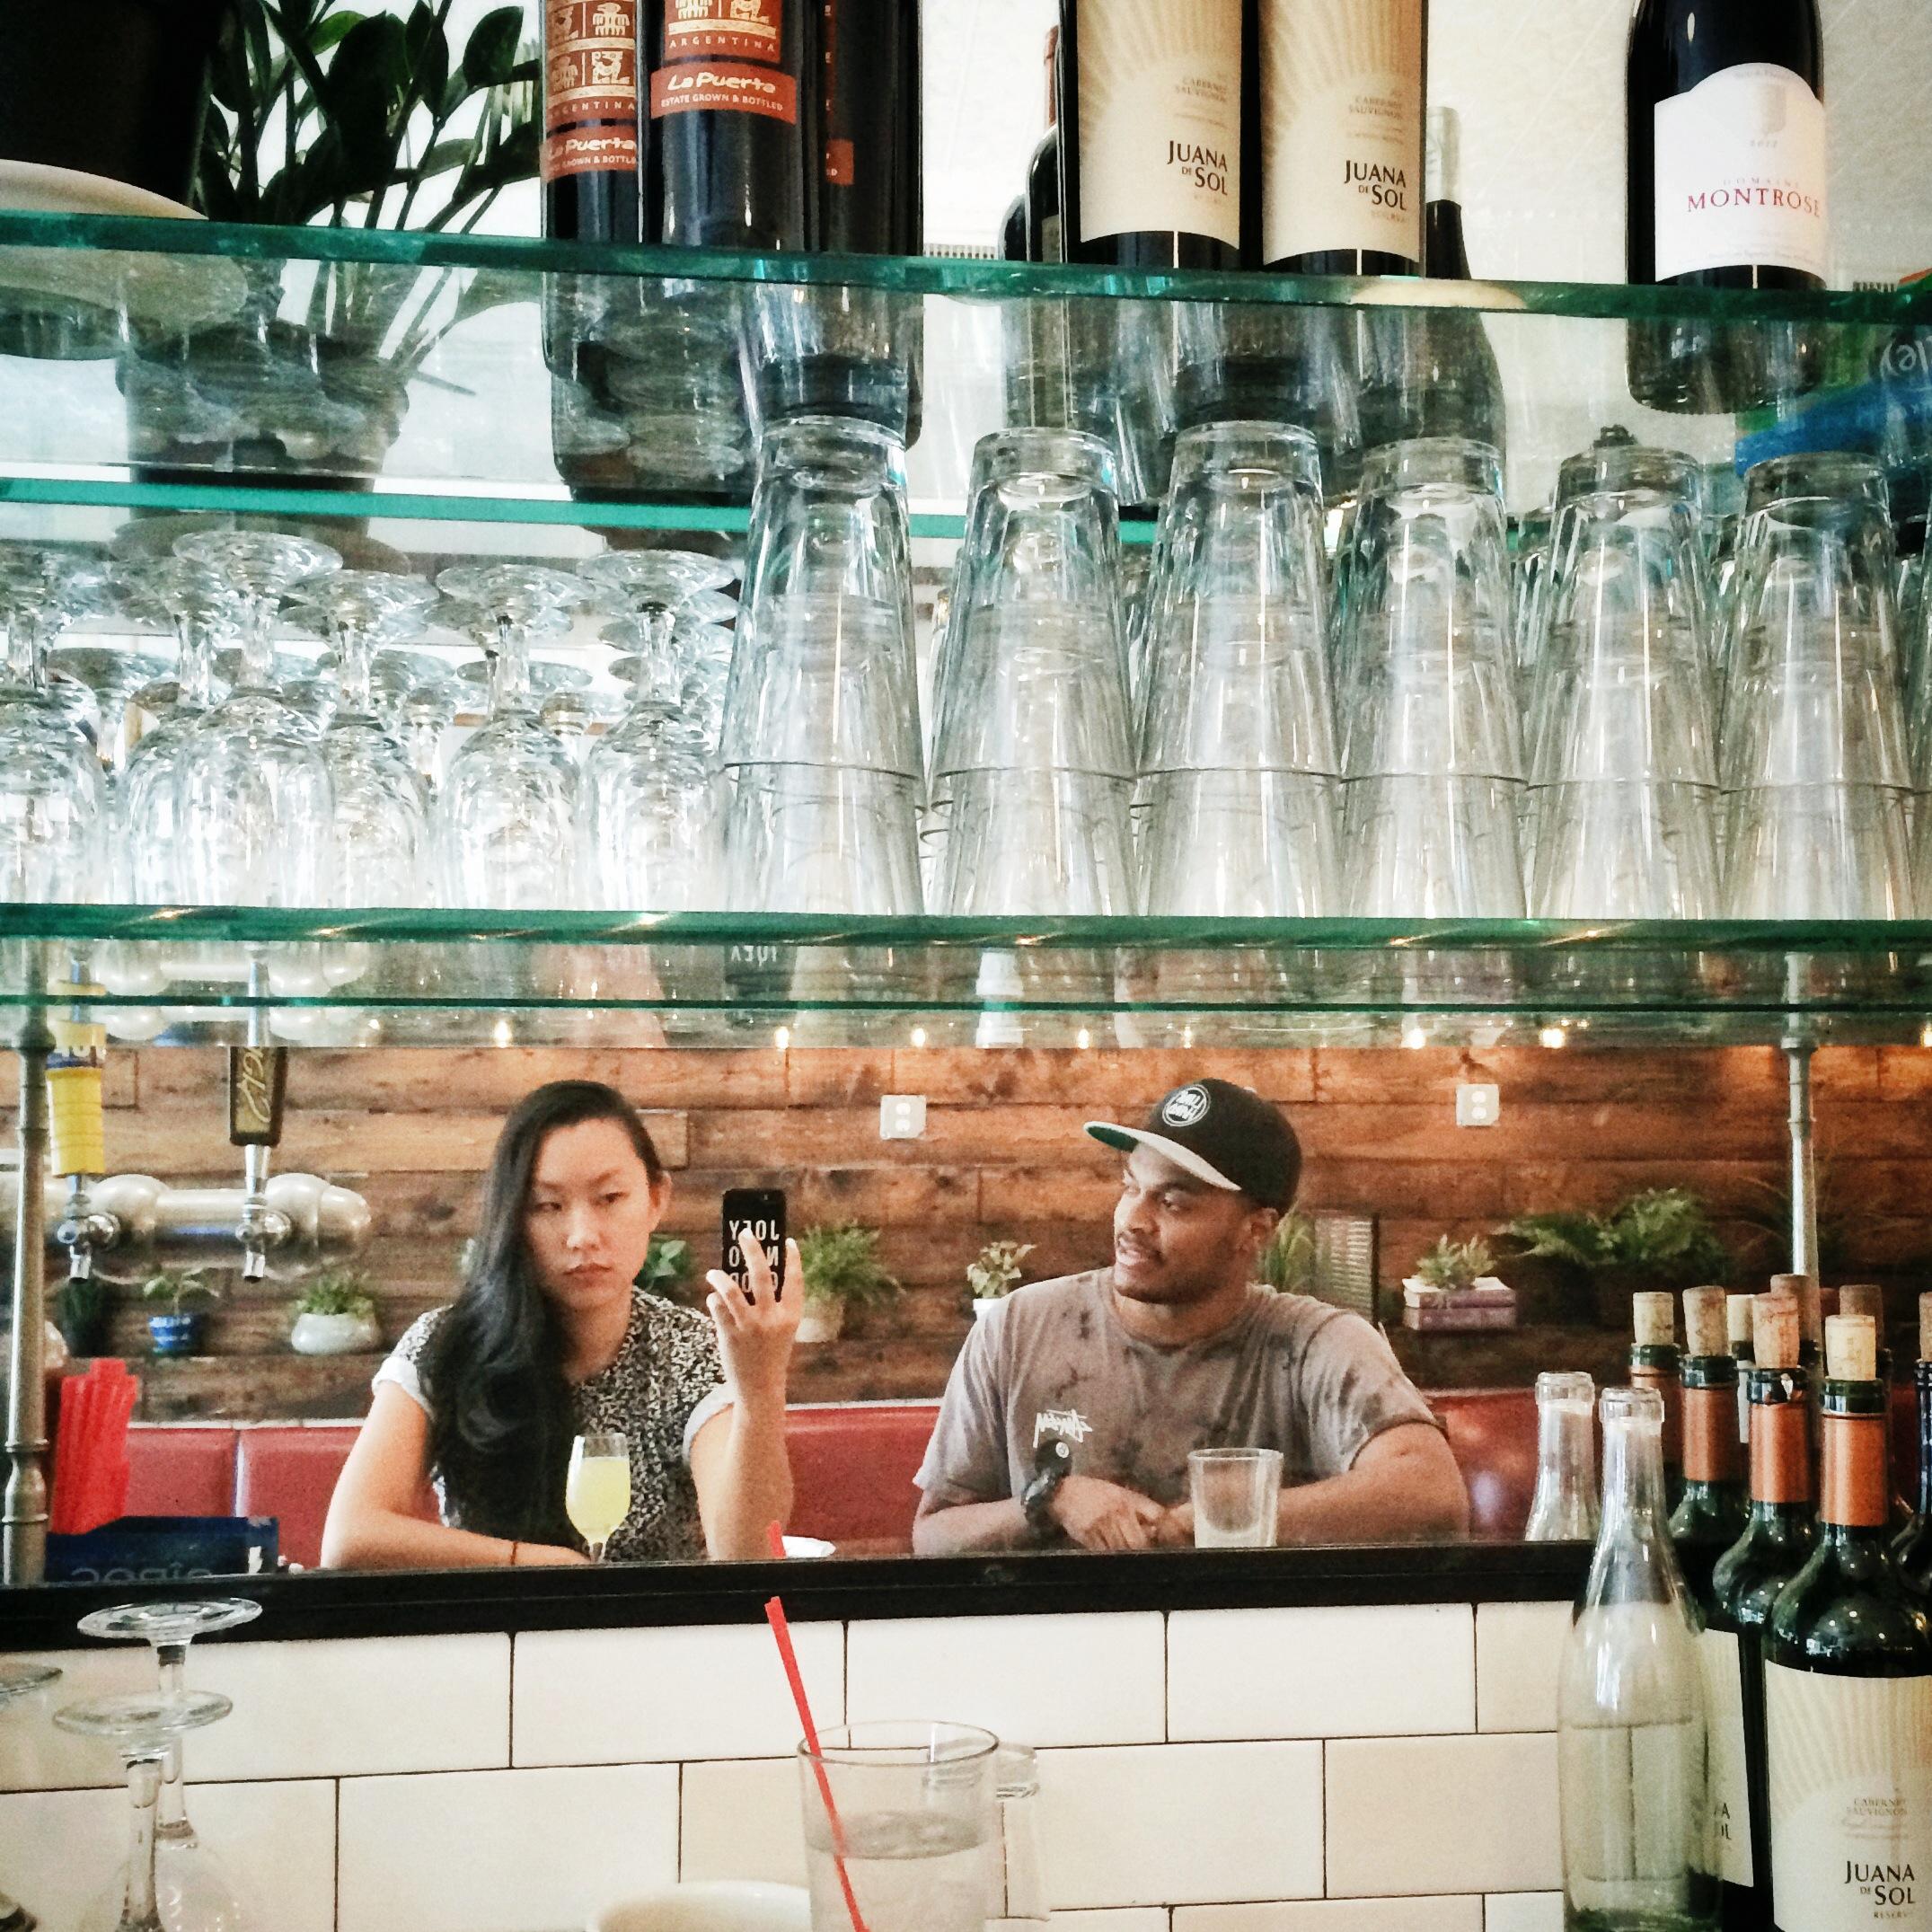 Breakfast with Lee Bannon, Brooklyn 2014